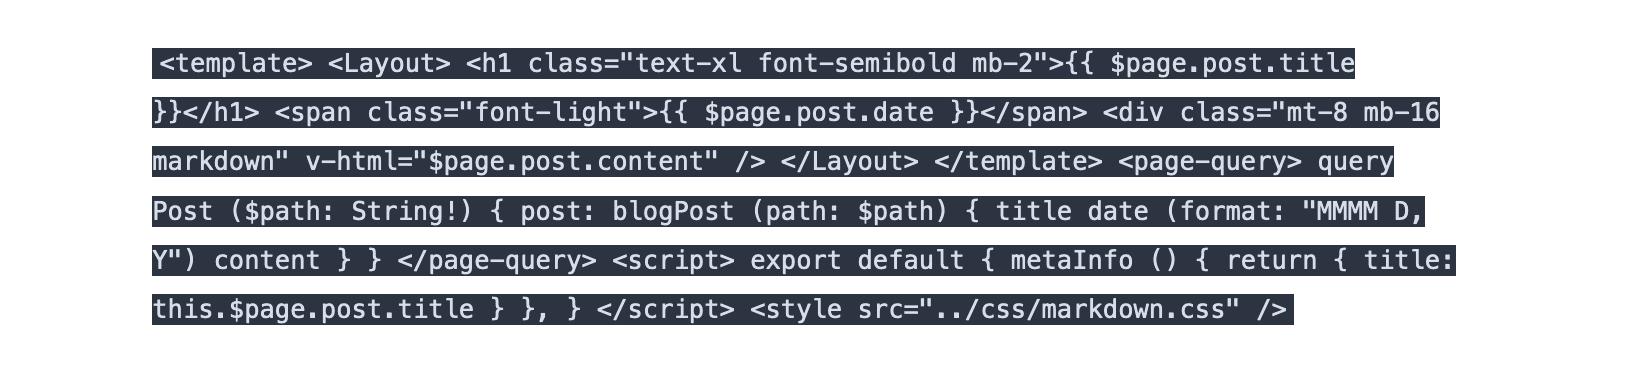 Blog post with broken syntax highlighting